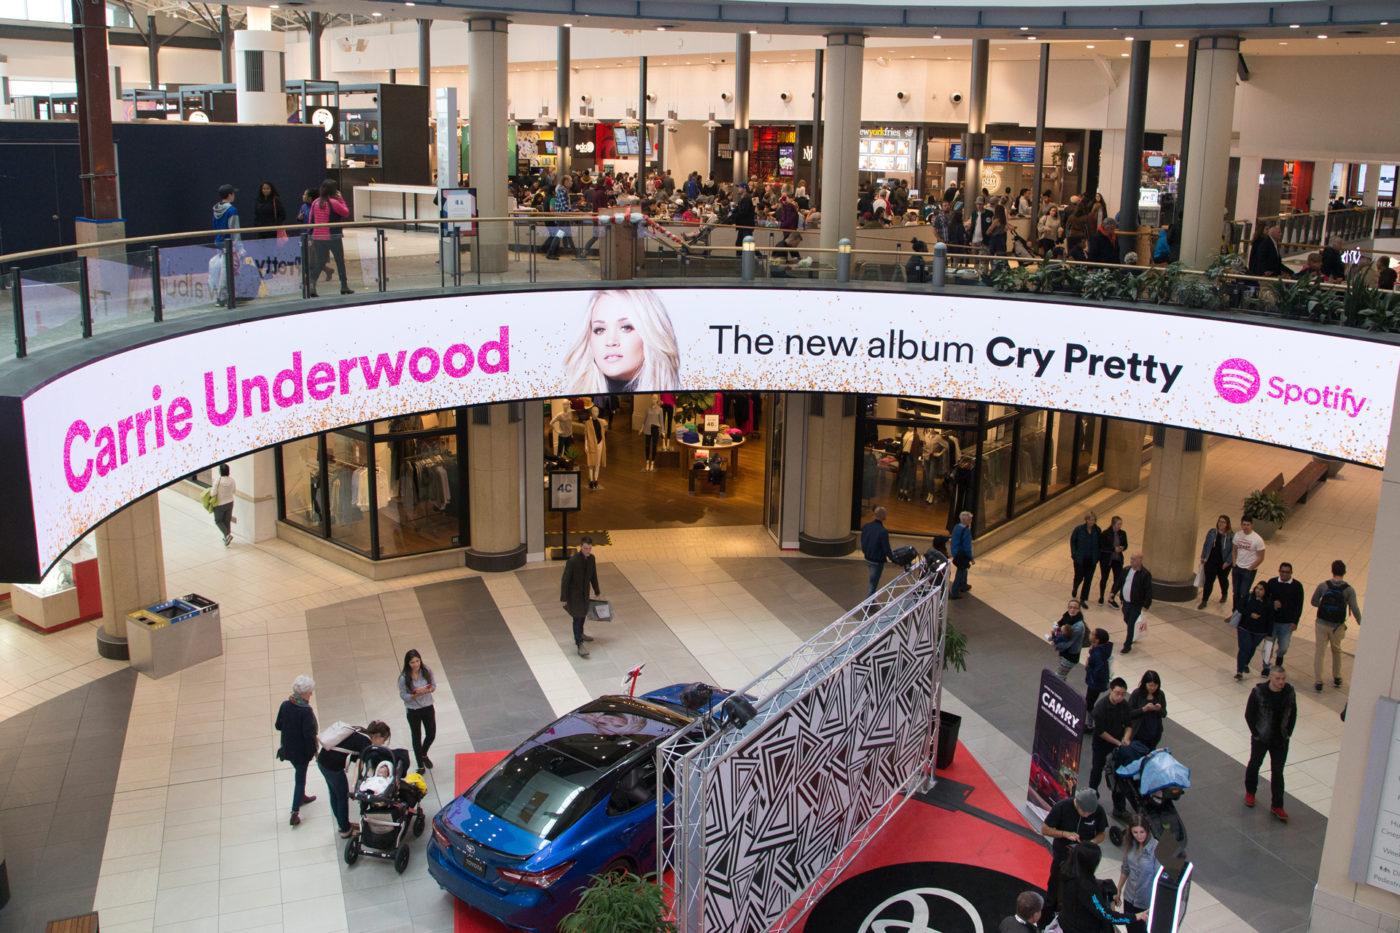 Spotify - Carrie Underwood - Malls - CF Chinook Centre - Digital Rotunda (Calgary, Alberta)